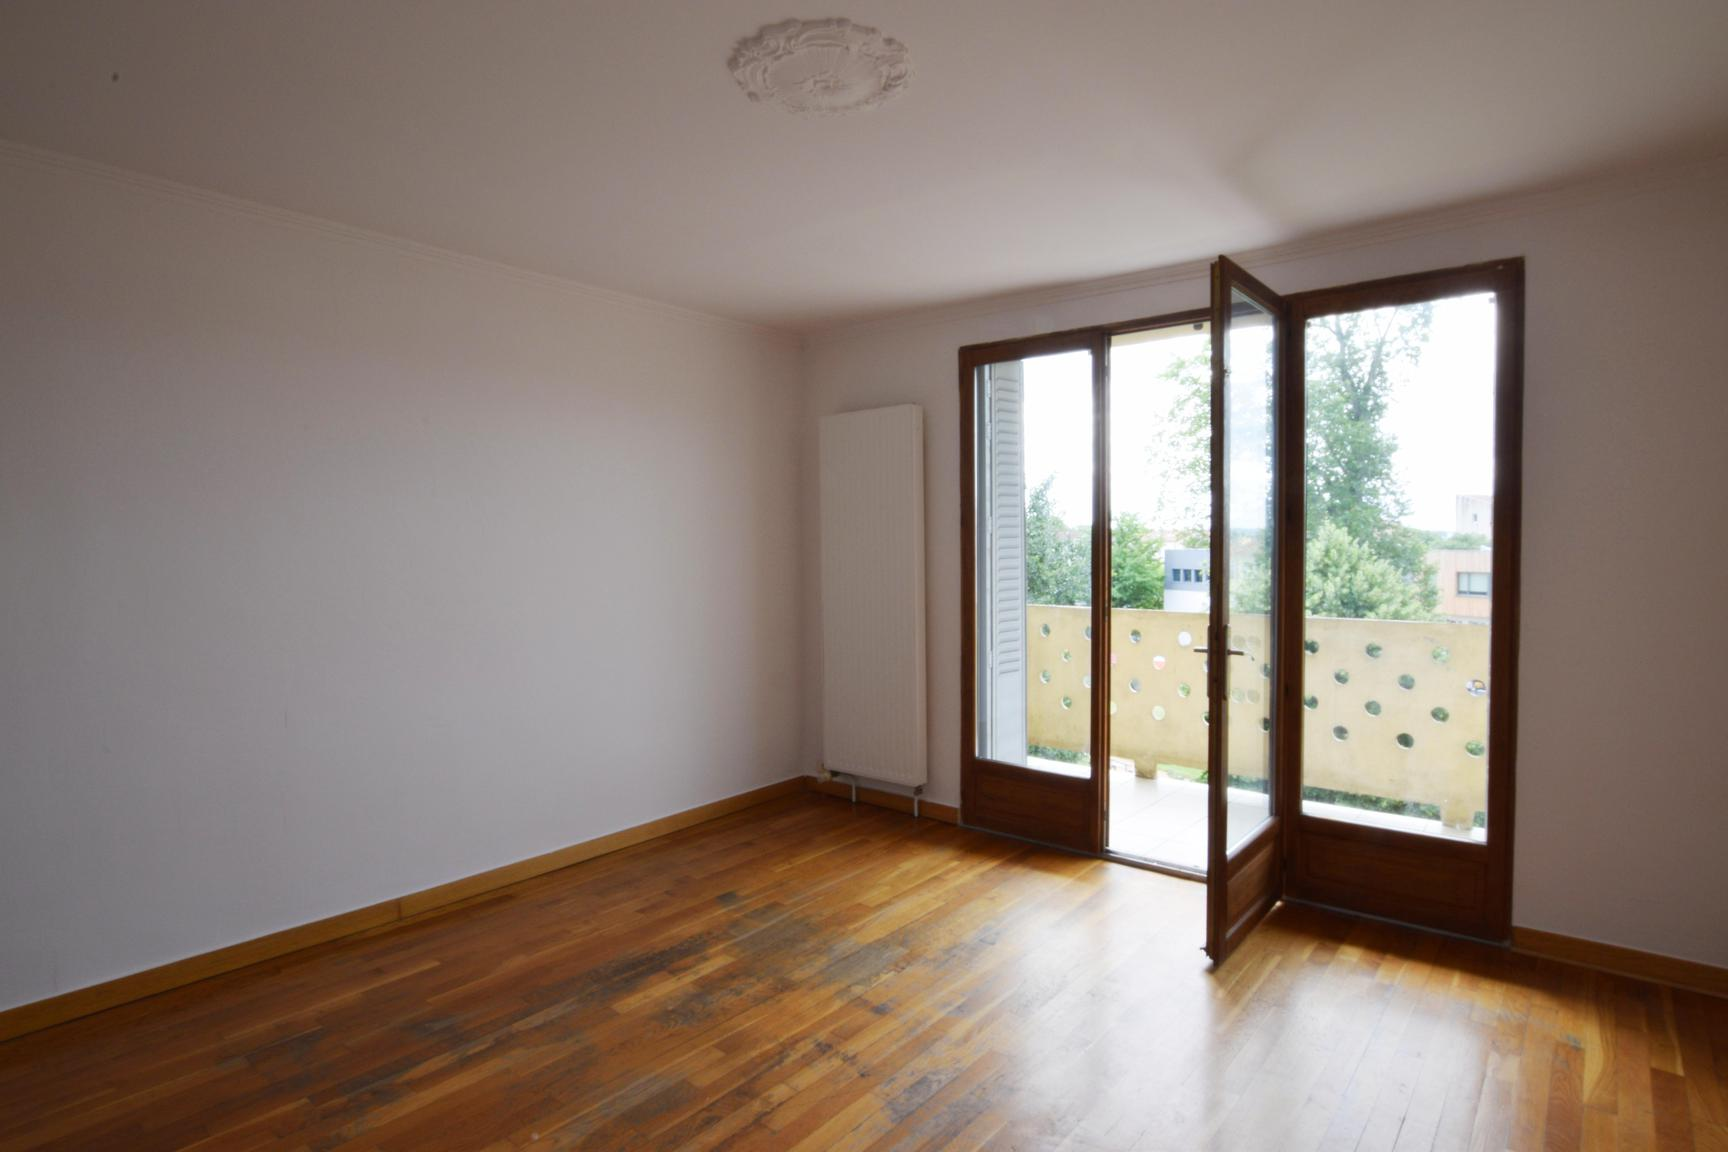 Annonce vente appartement oullins 69600 55 m 168 000 for Annonce vente appartement